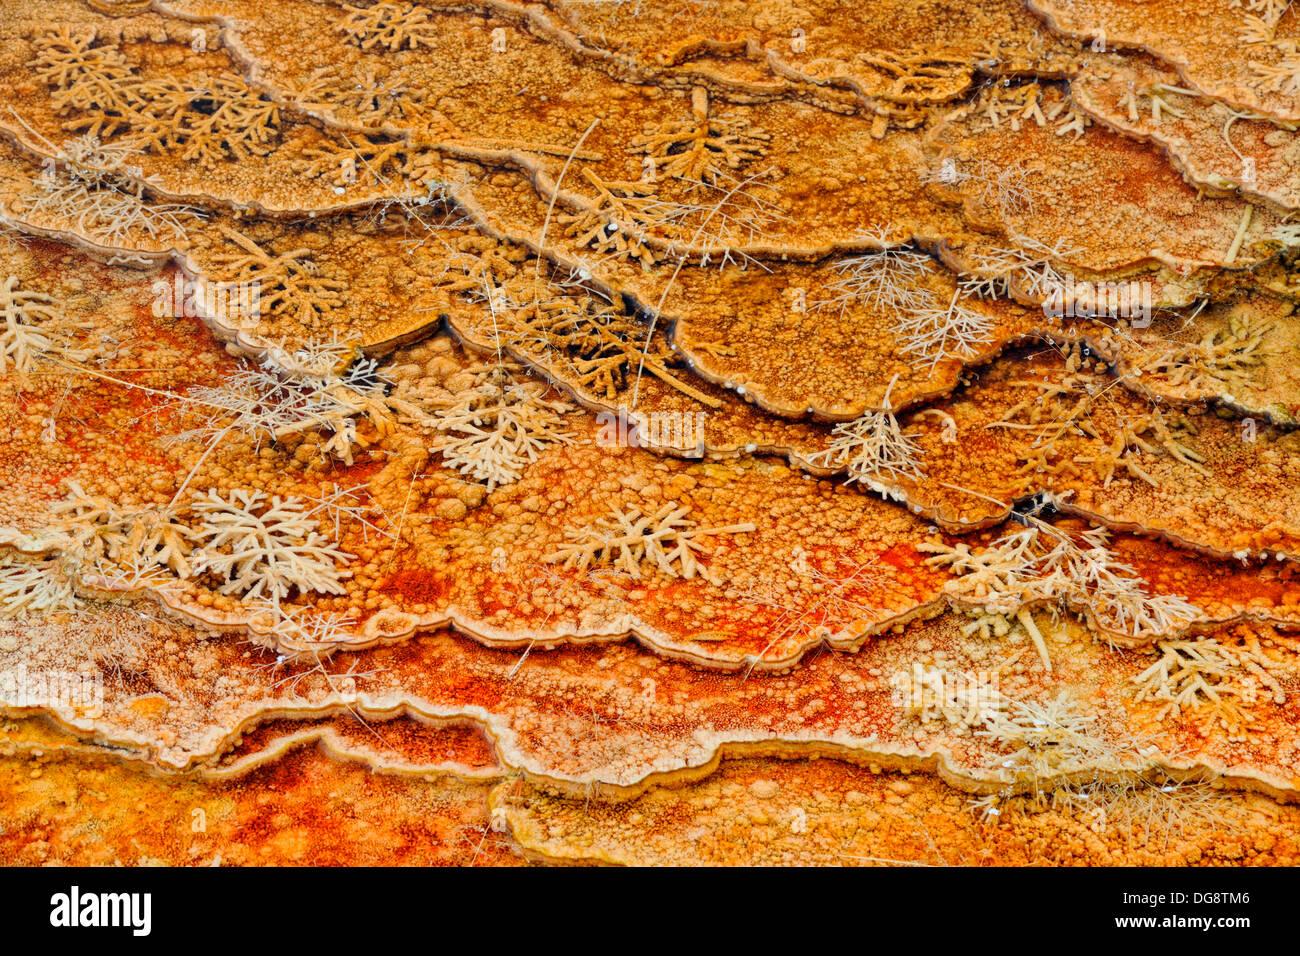 Cyanobacteria thermophyllic algae on tiny terraces, Grassy Spring Mammoth Hot Springs Yellowstone National Park, Wyoming, USA - Stock Image